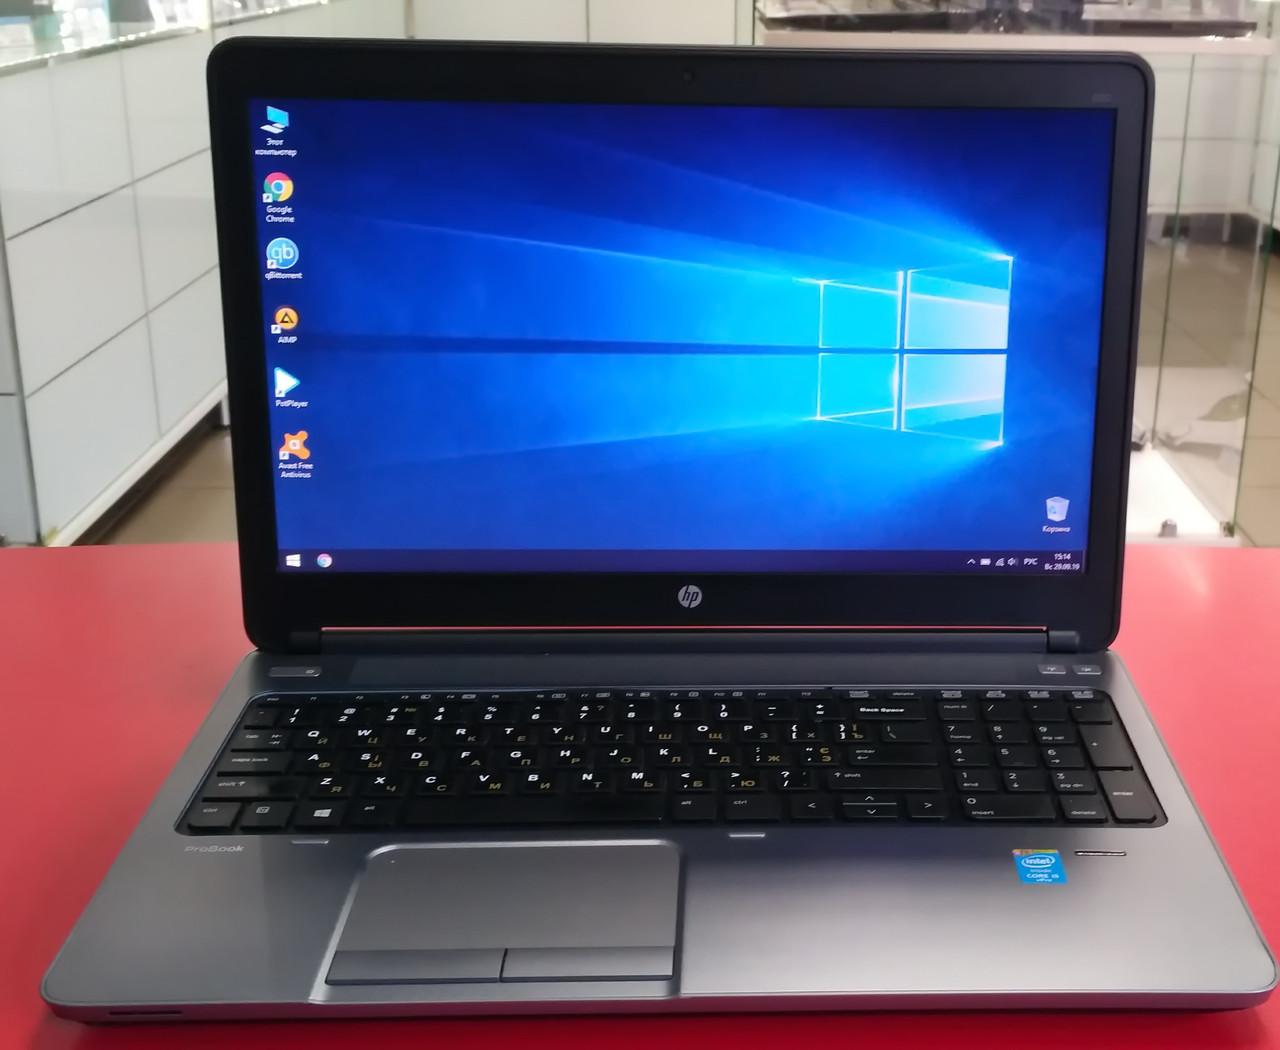 "Ноутбук HP ProBook 650 G1 15.6"" Intel Core i5 2.6 GHz 4 GB RAM 120 SSD Black-Silver Б/У"